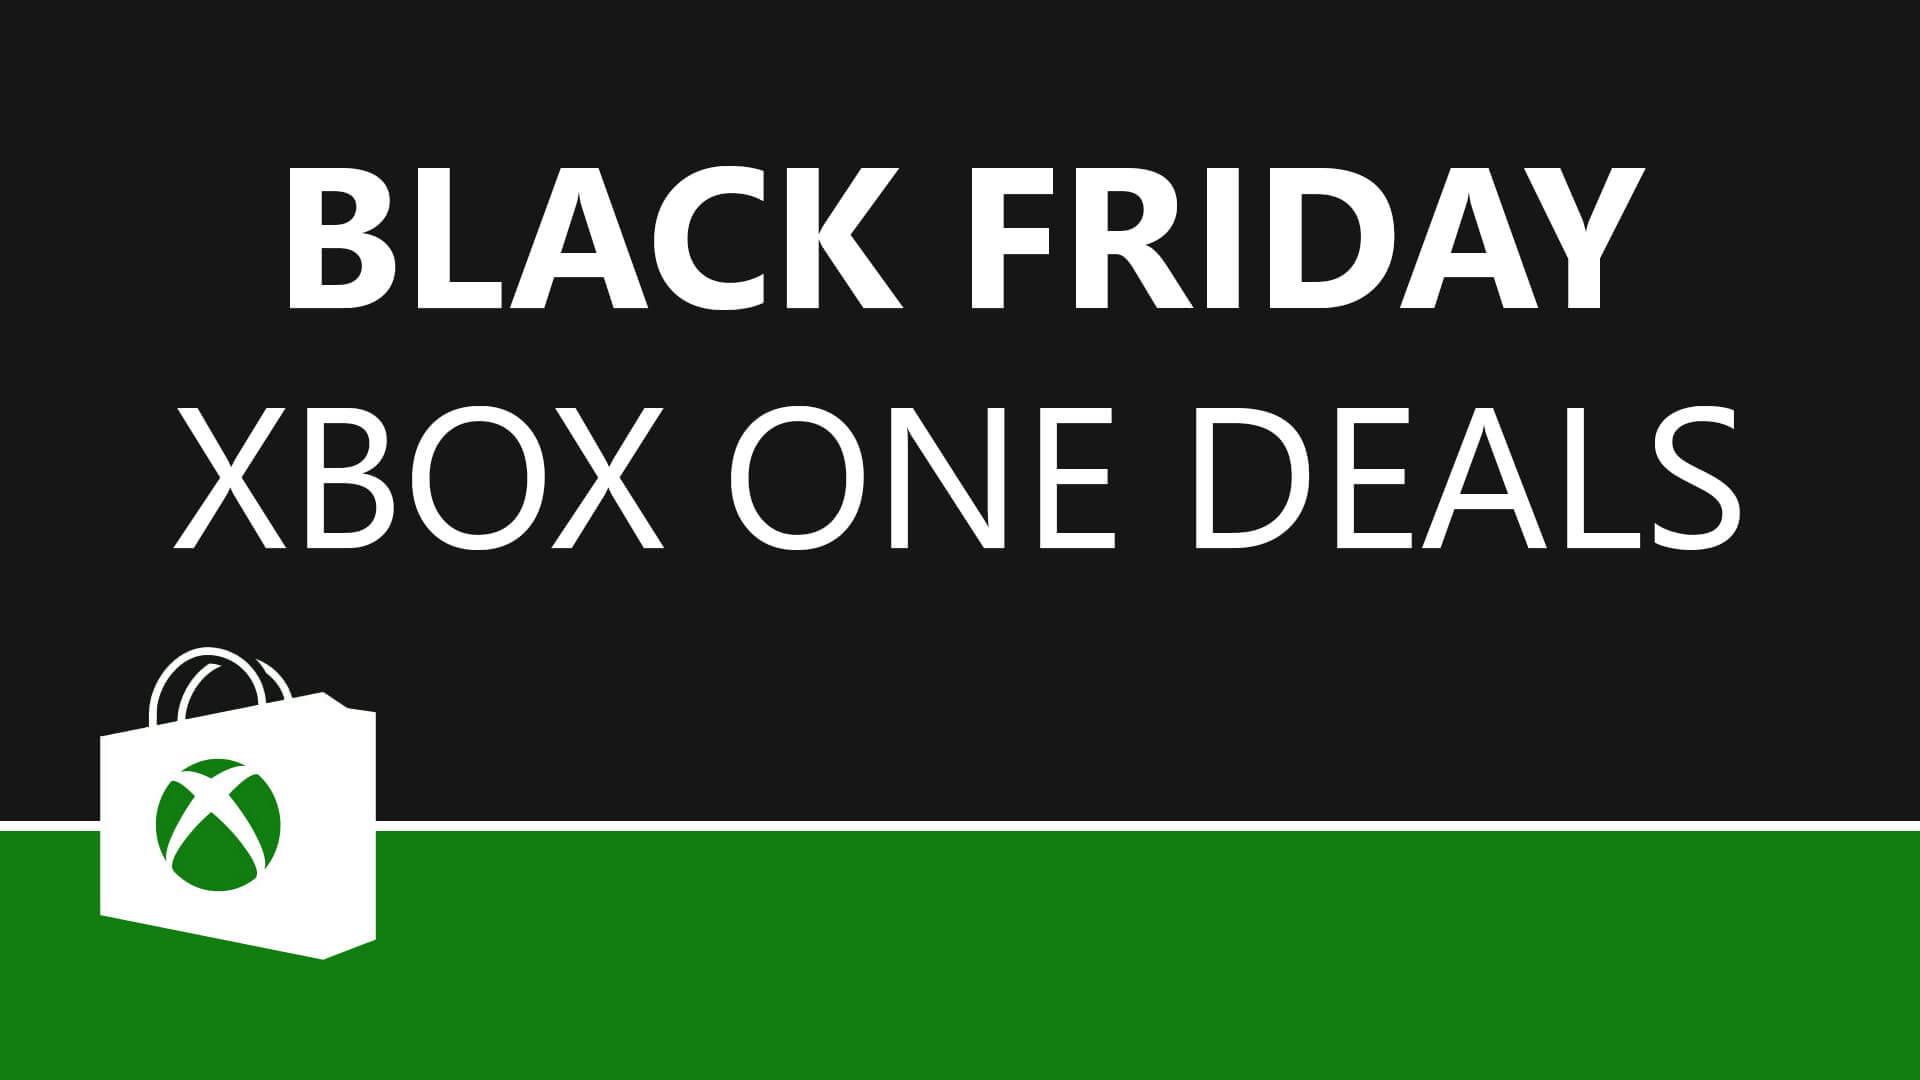 Xbox One Black Friday Deals 2018